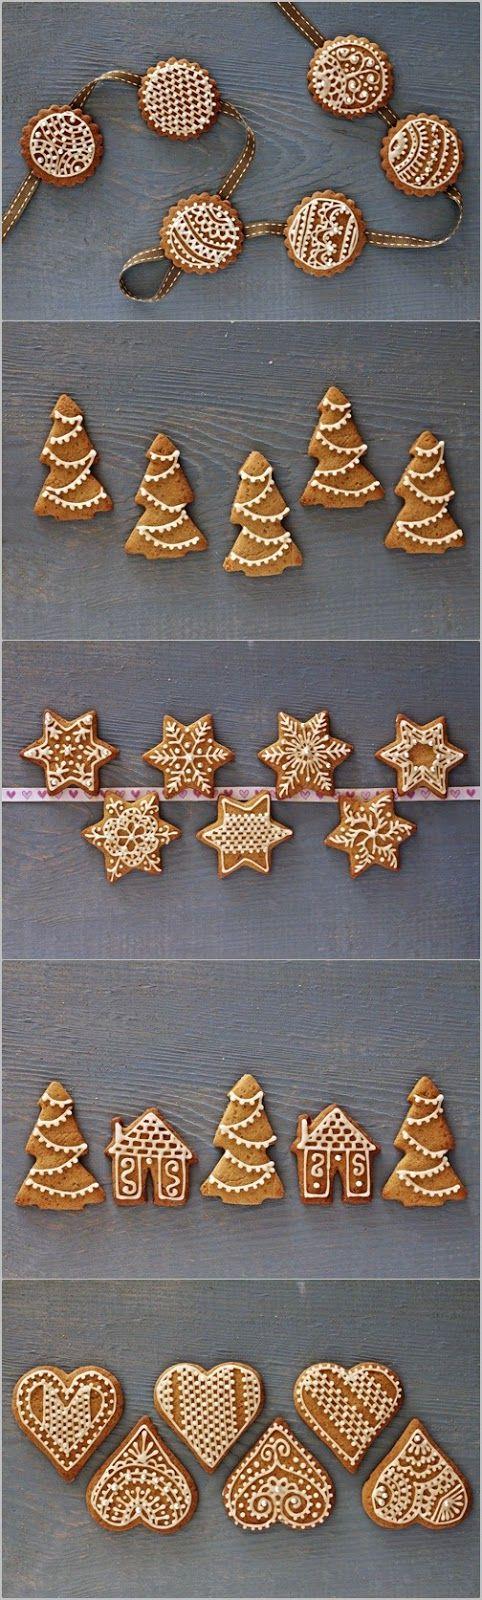 festive decorated gingerbread cookies rezept biscotti di natale weihnachtspl tzchen. Black Bedroom Furniture Sets. Home Design Ideas